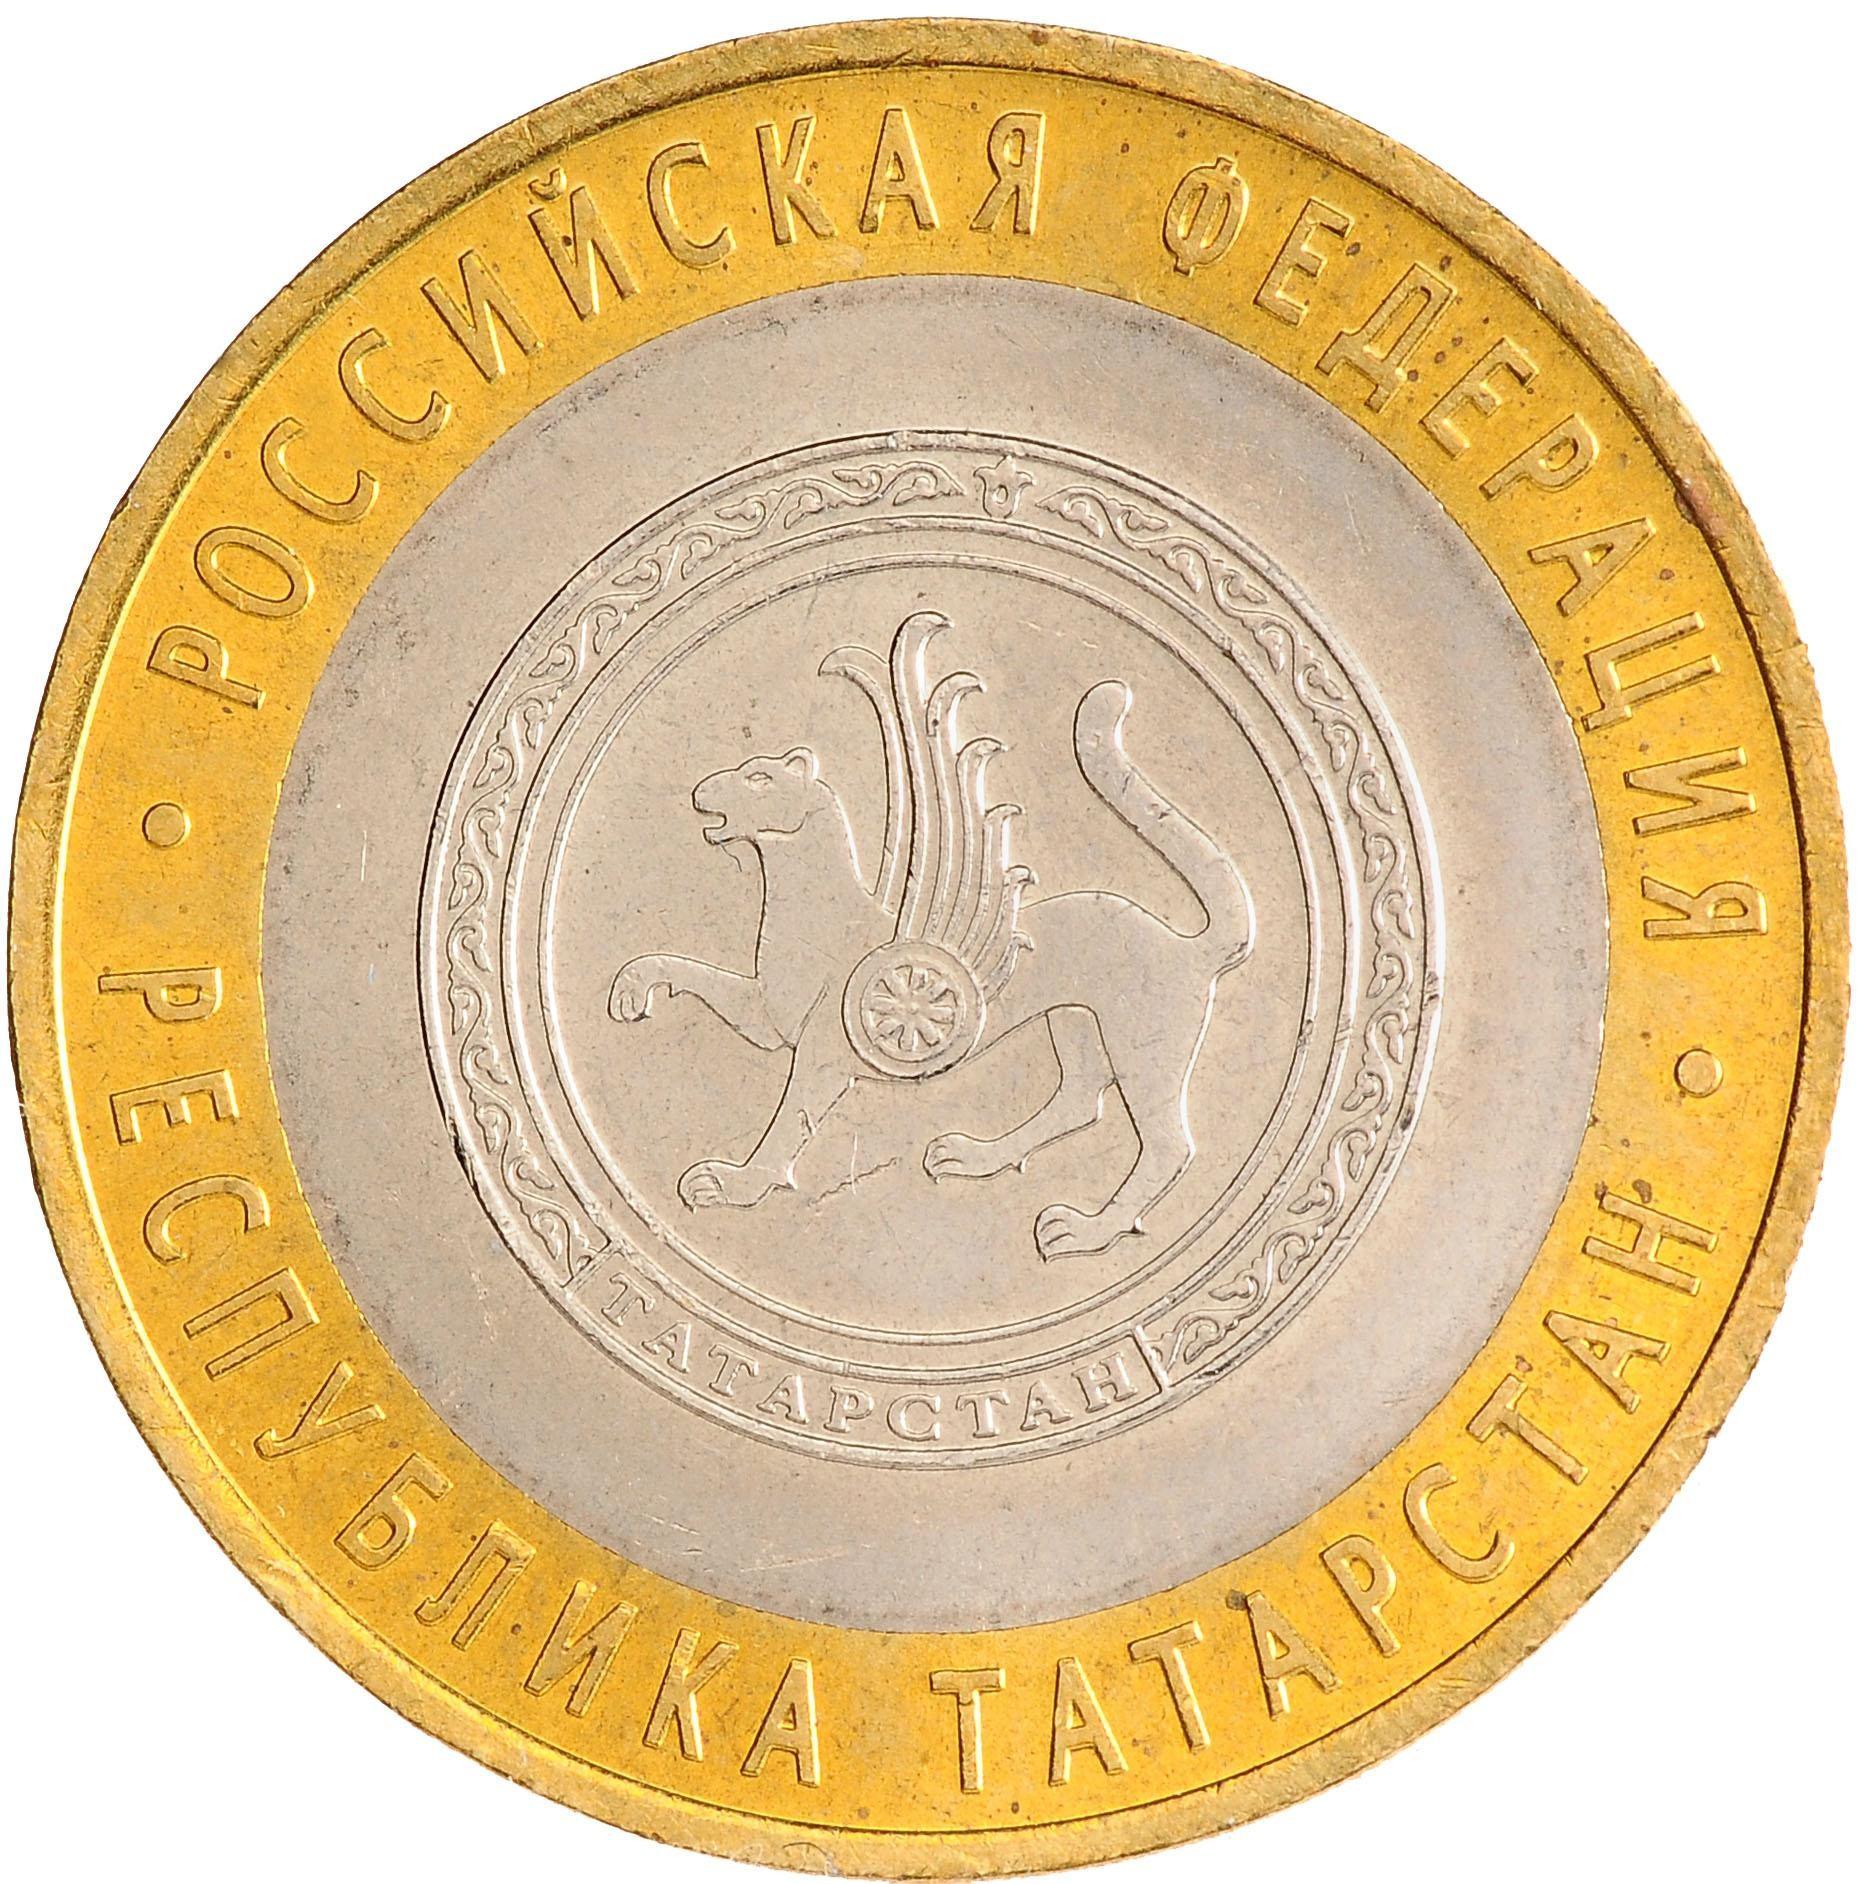 Мешковая монета 10 рублей 2005 СПМД Республика Татарстан